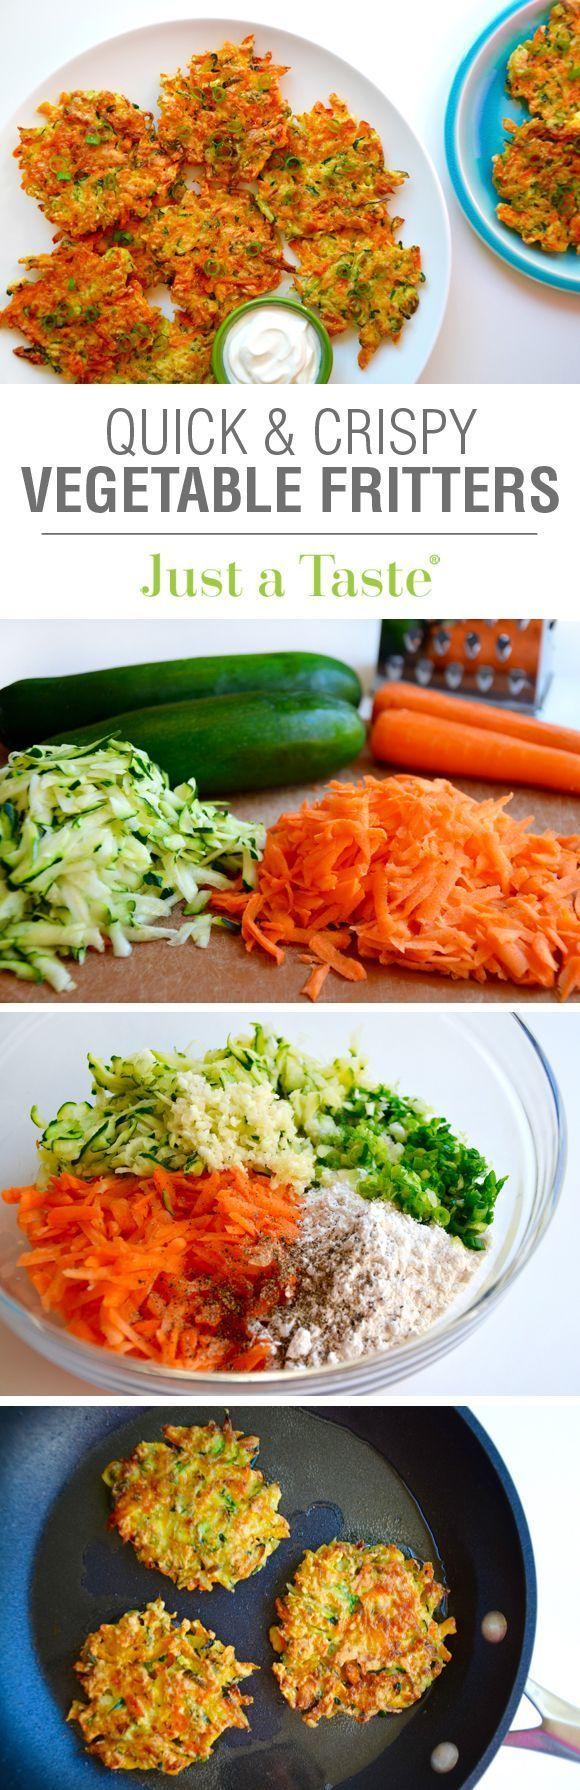 Quick and Crispy Vegetable Fritters recipe via http://justataste.com